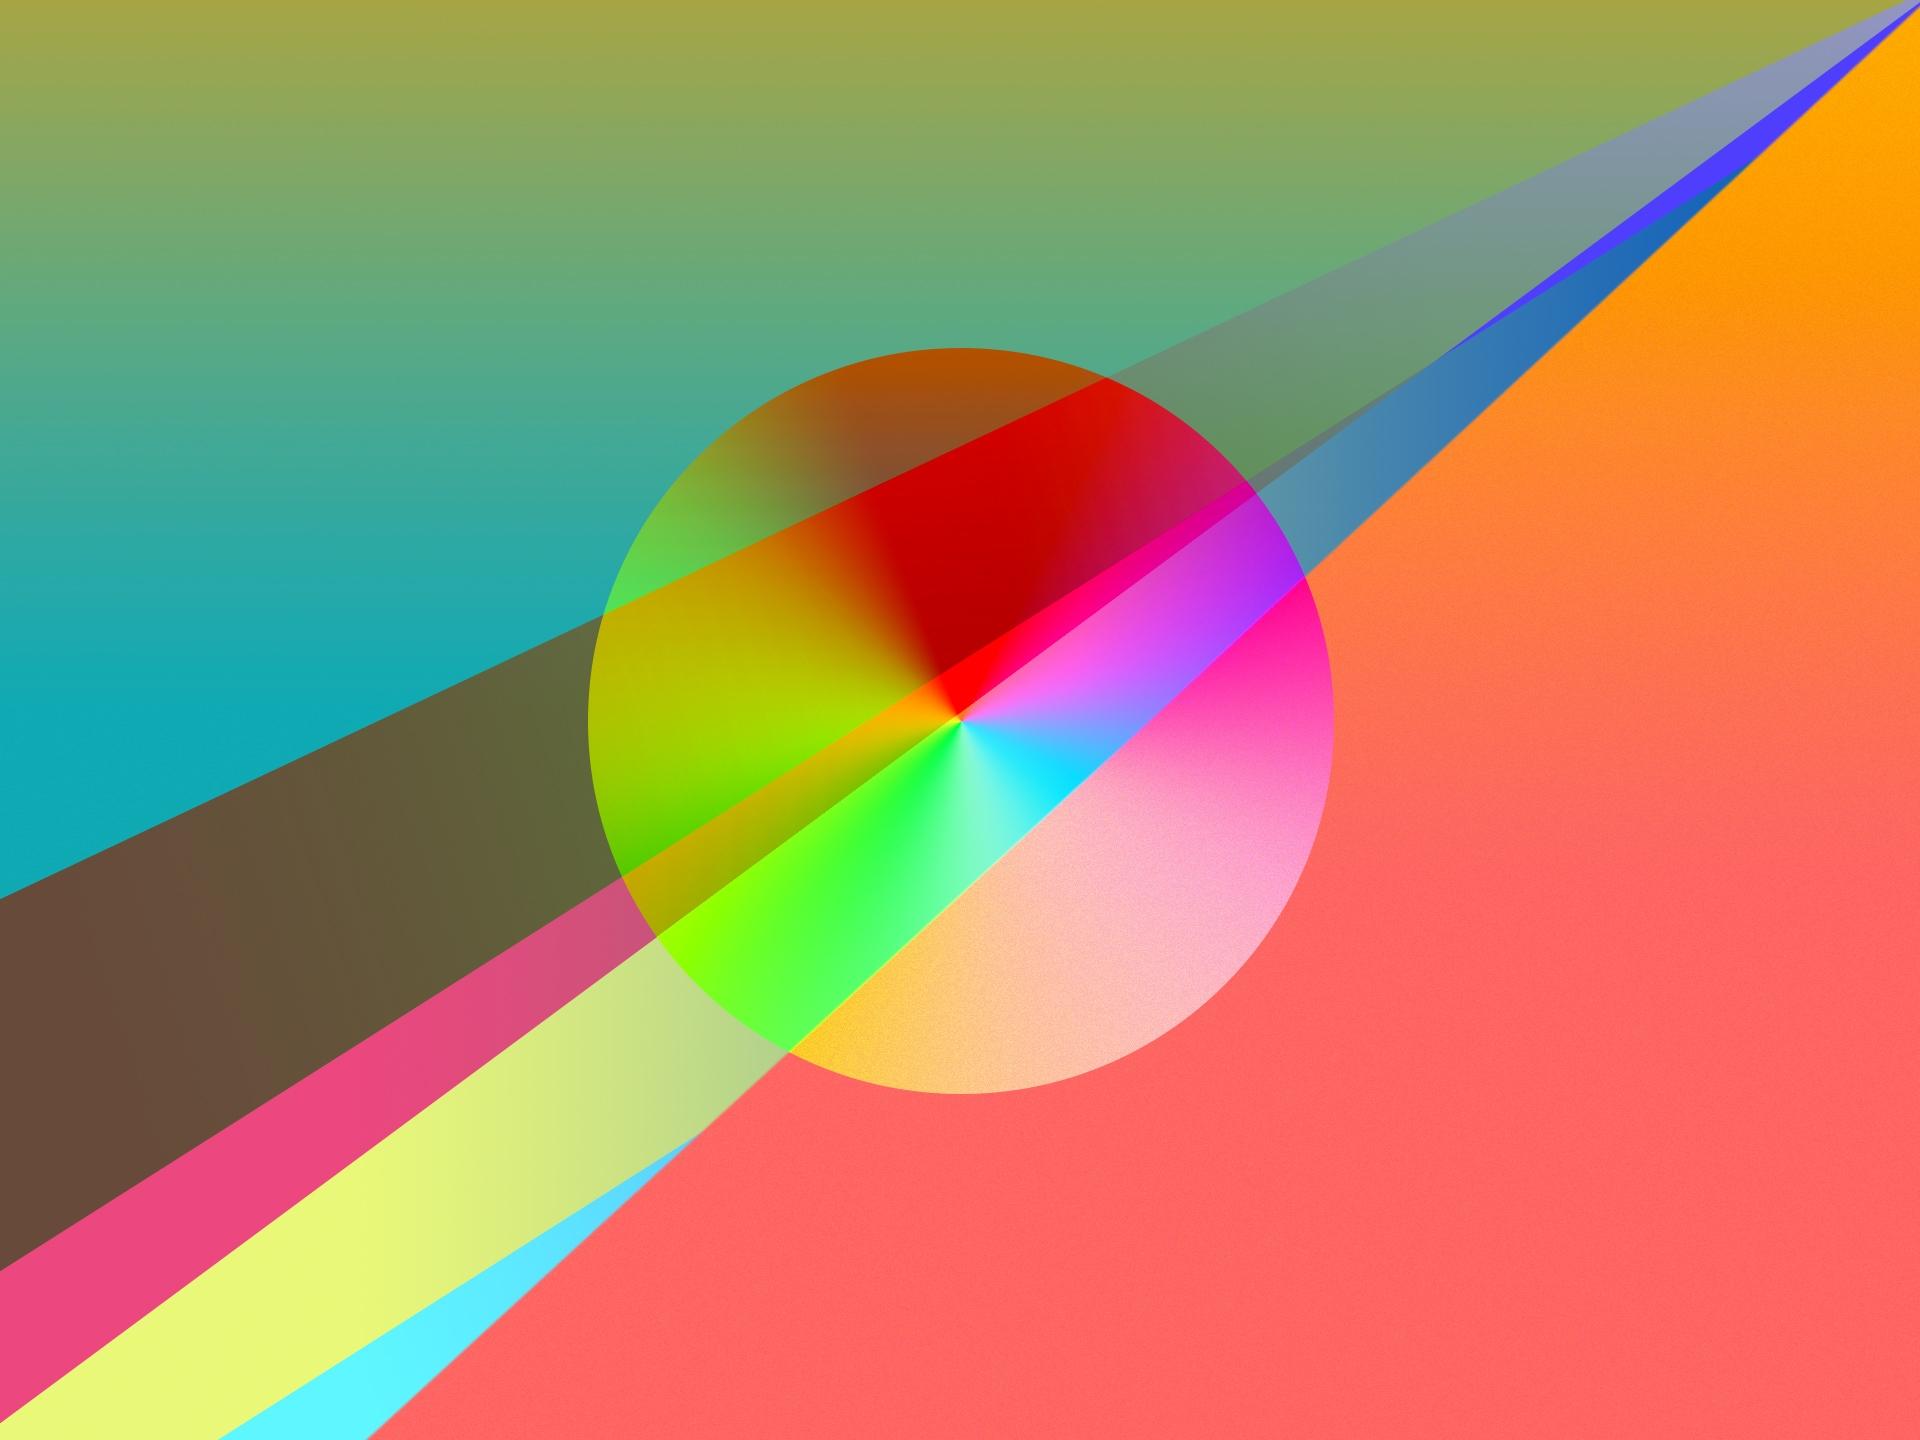 spectrumball.jpg